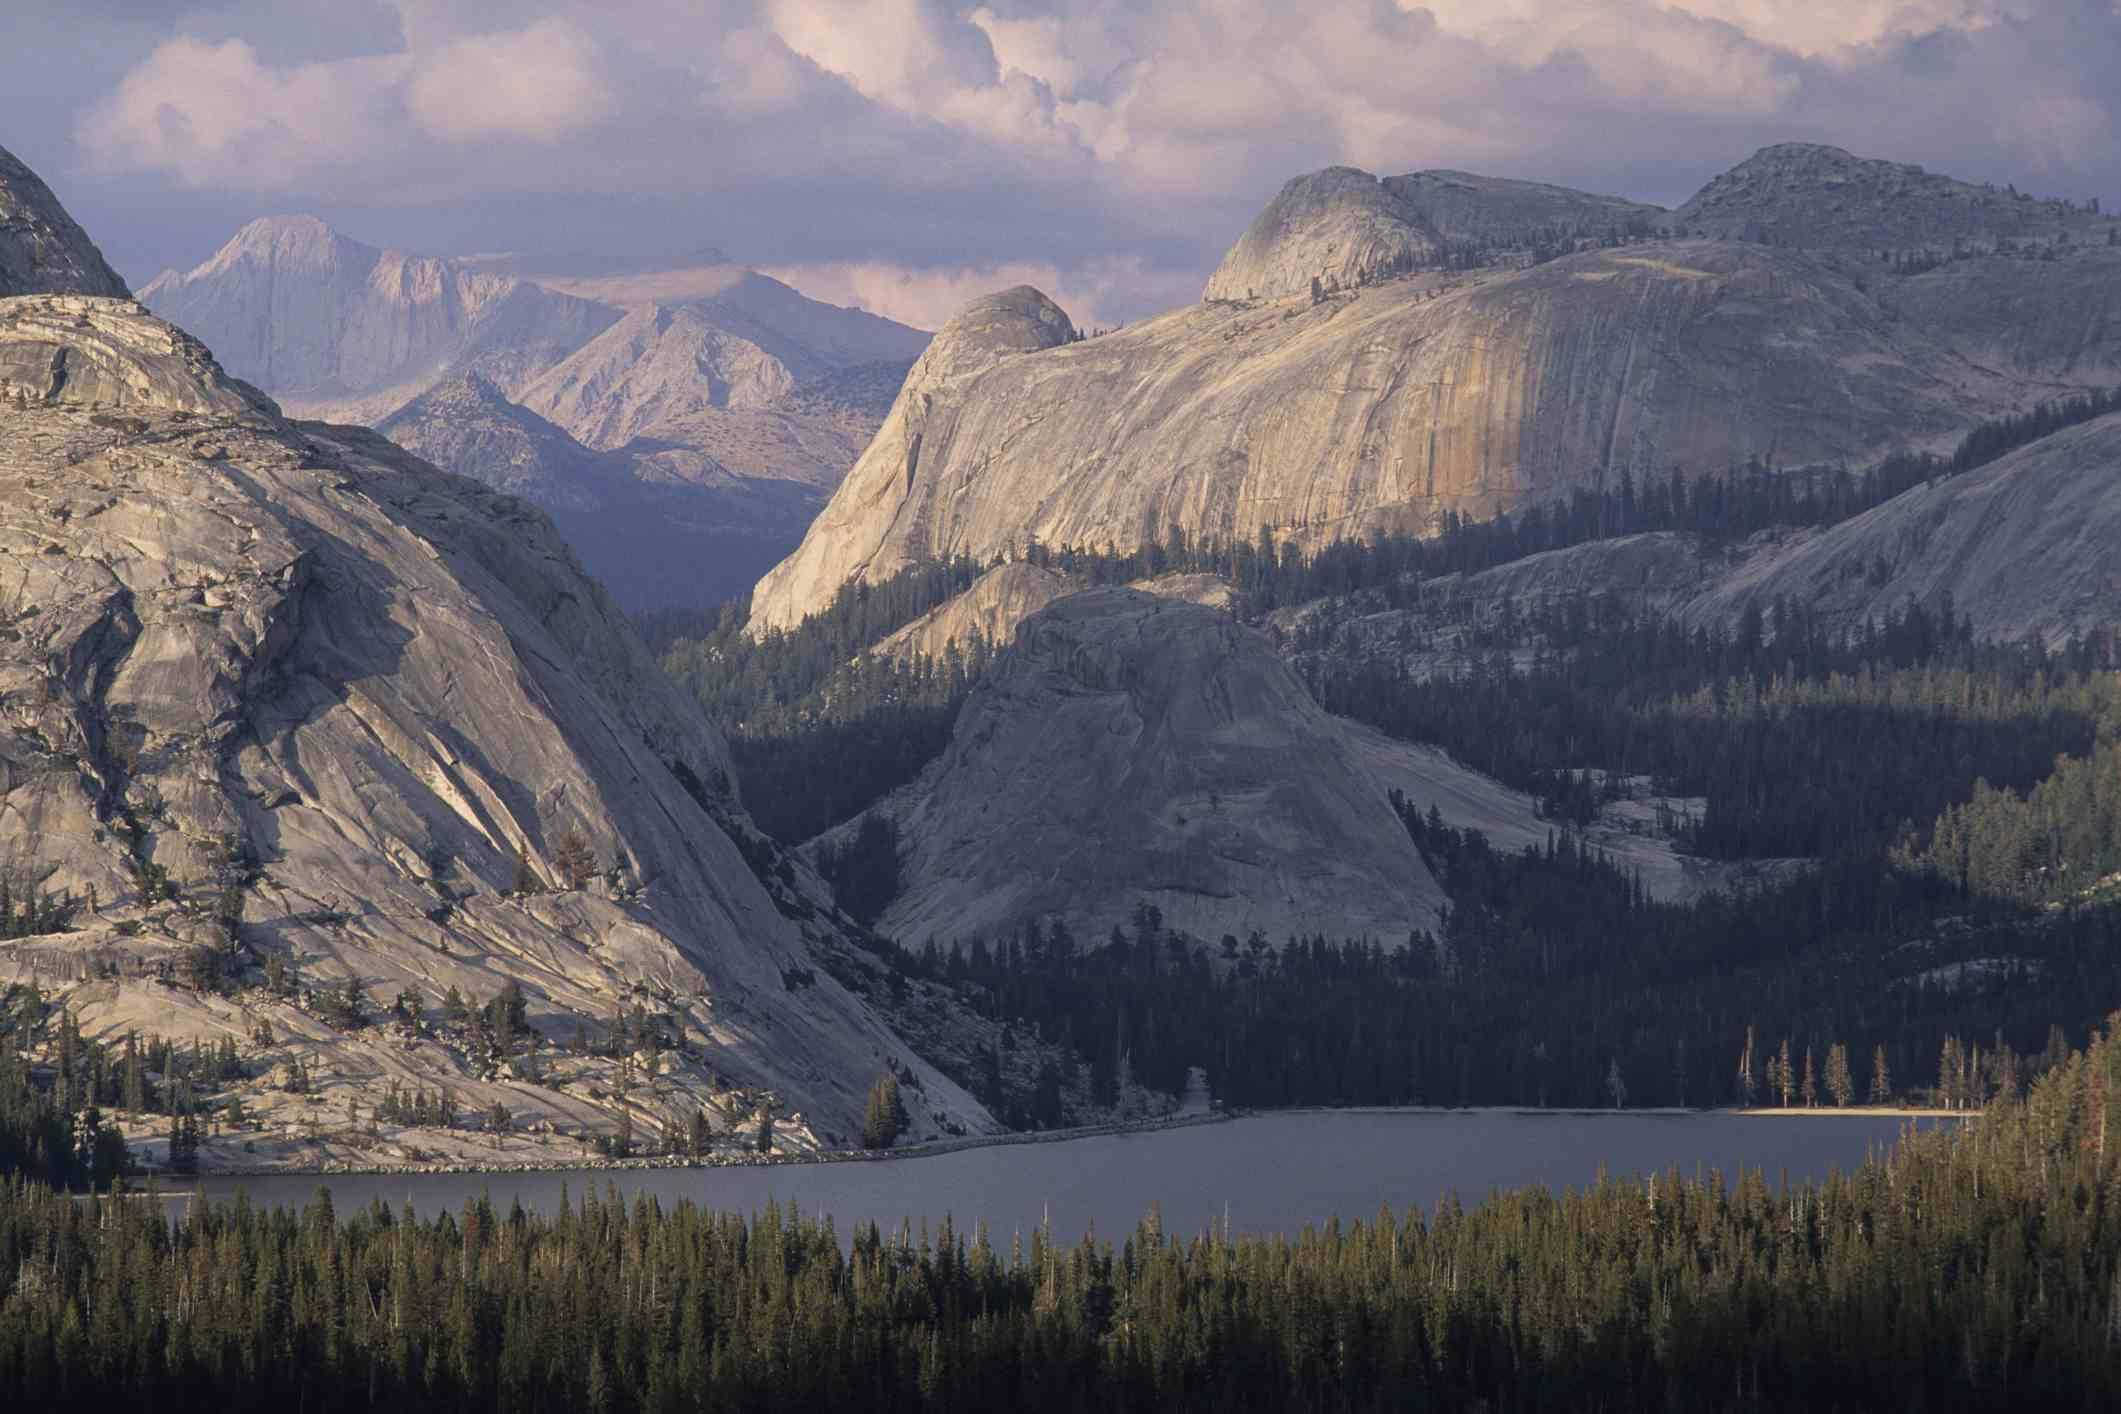 Tenaya Lake, Tuolumne Meadows, Yosemite National Park, California.